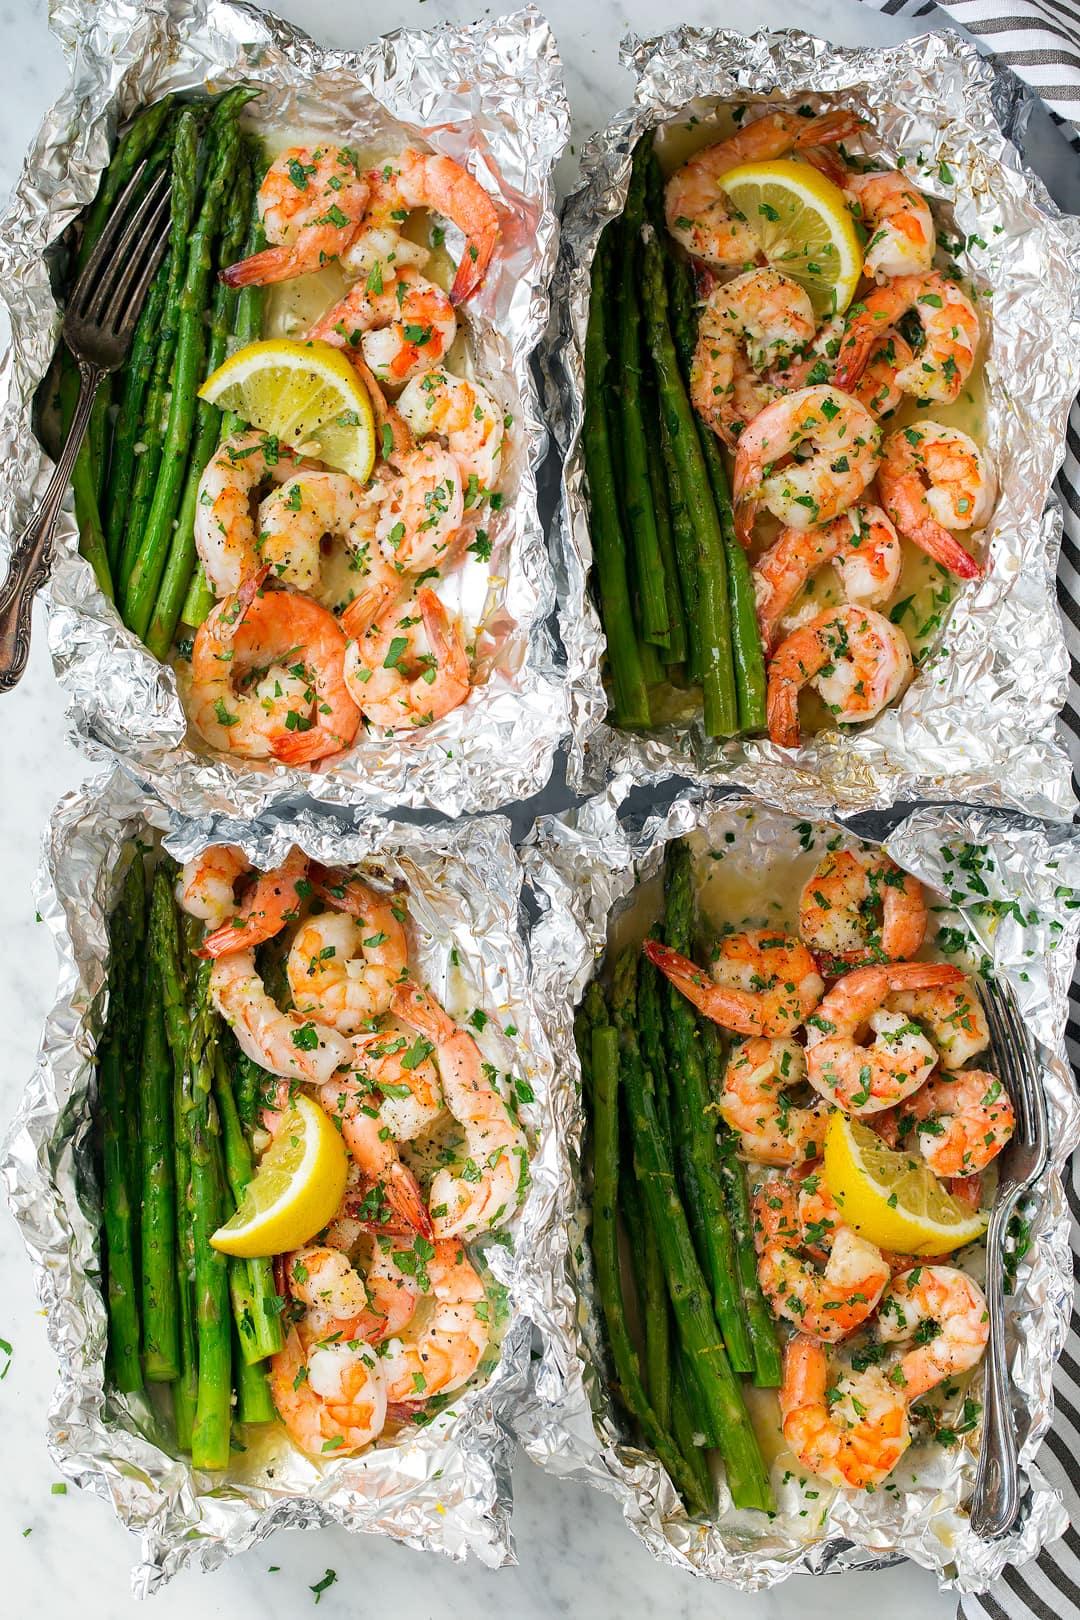 Shrimp And Asparagus Foil Packs With Garlic Lemon Butter